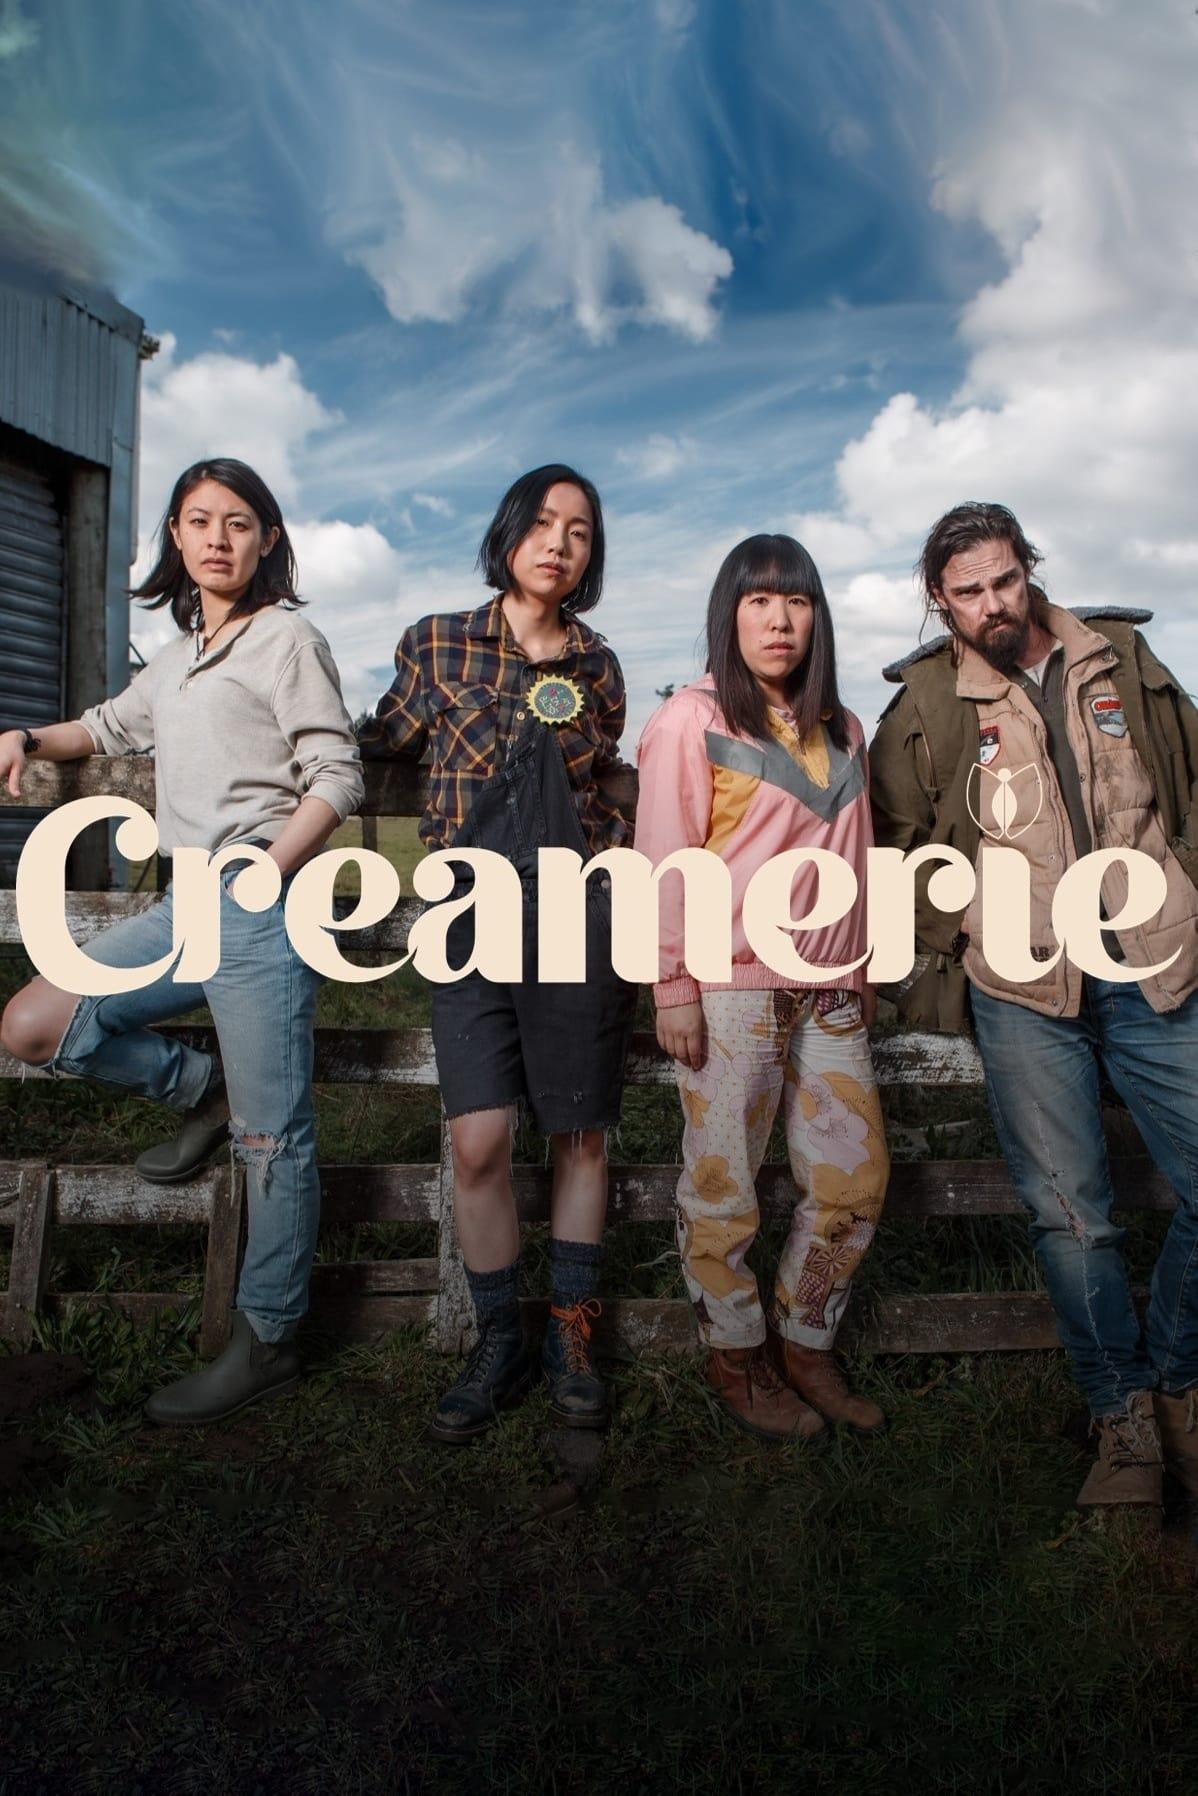 Creamerie TV Shows About Future